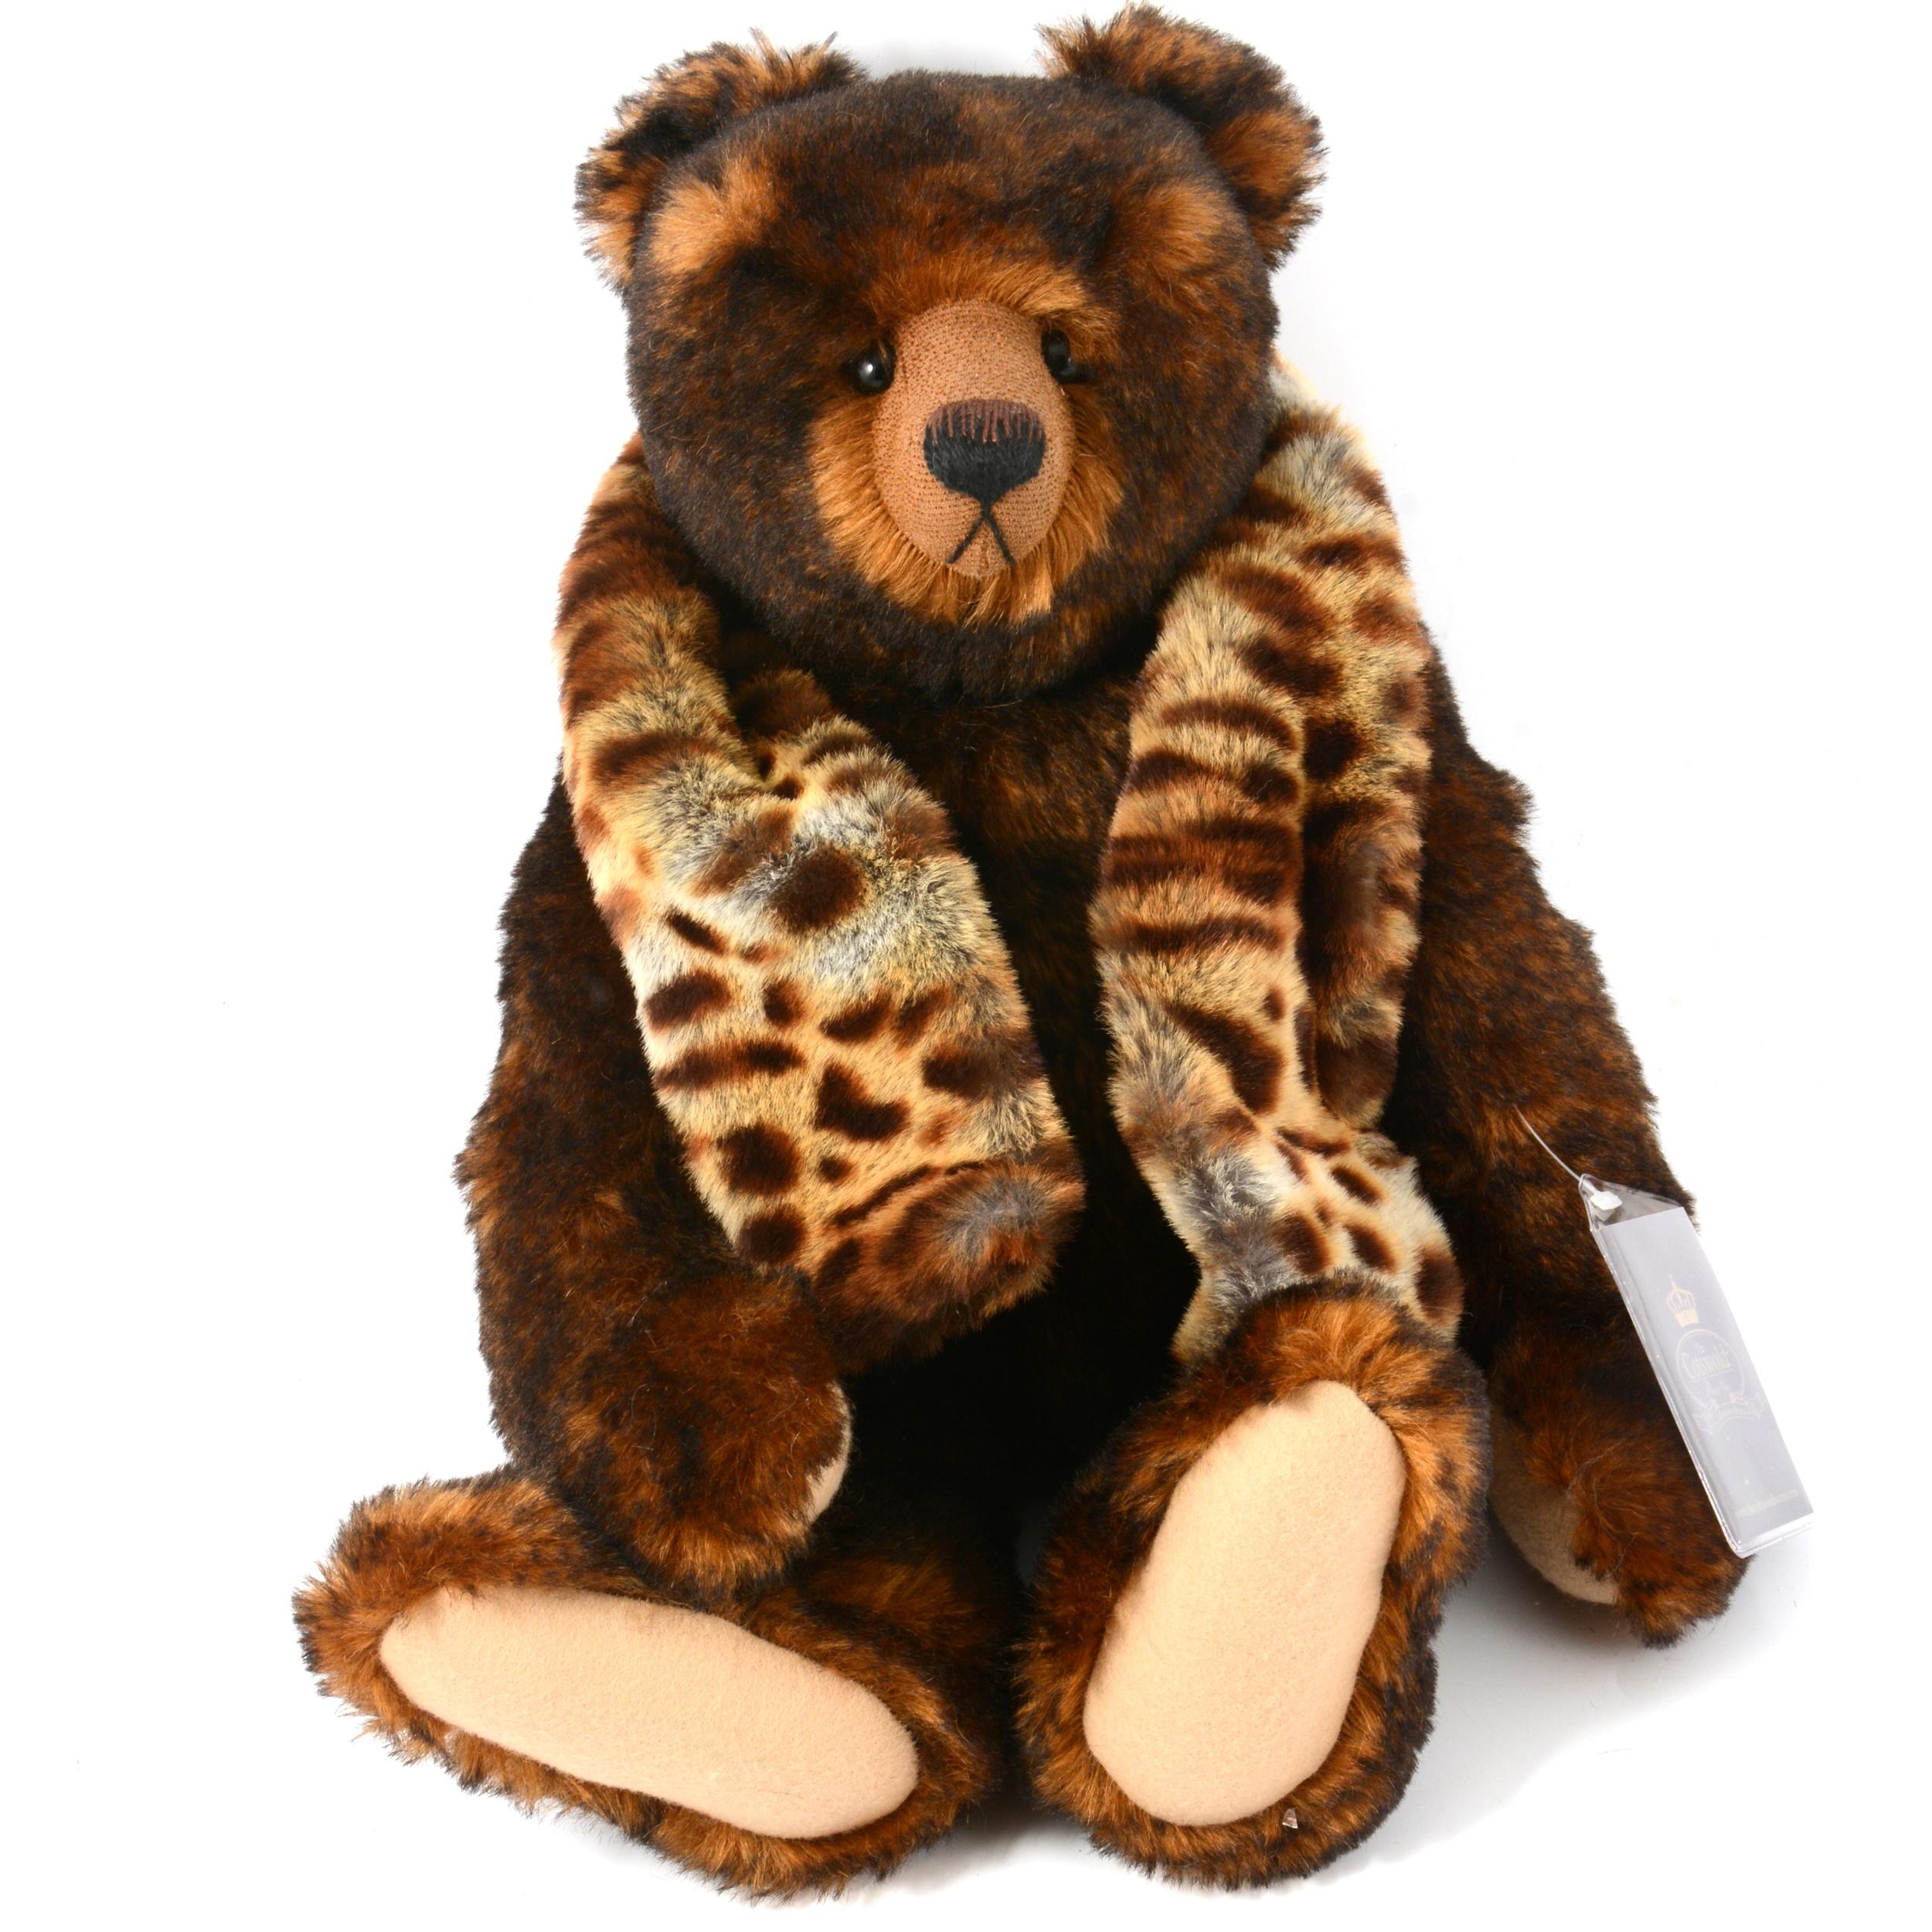 The Cotswold Bear Co, Nicholas bear 1/1 edition